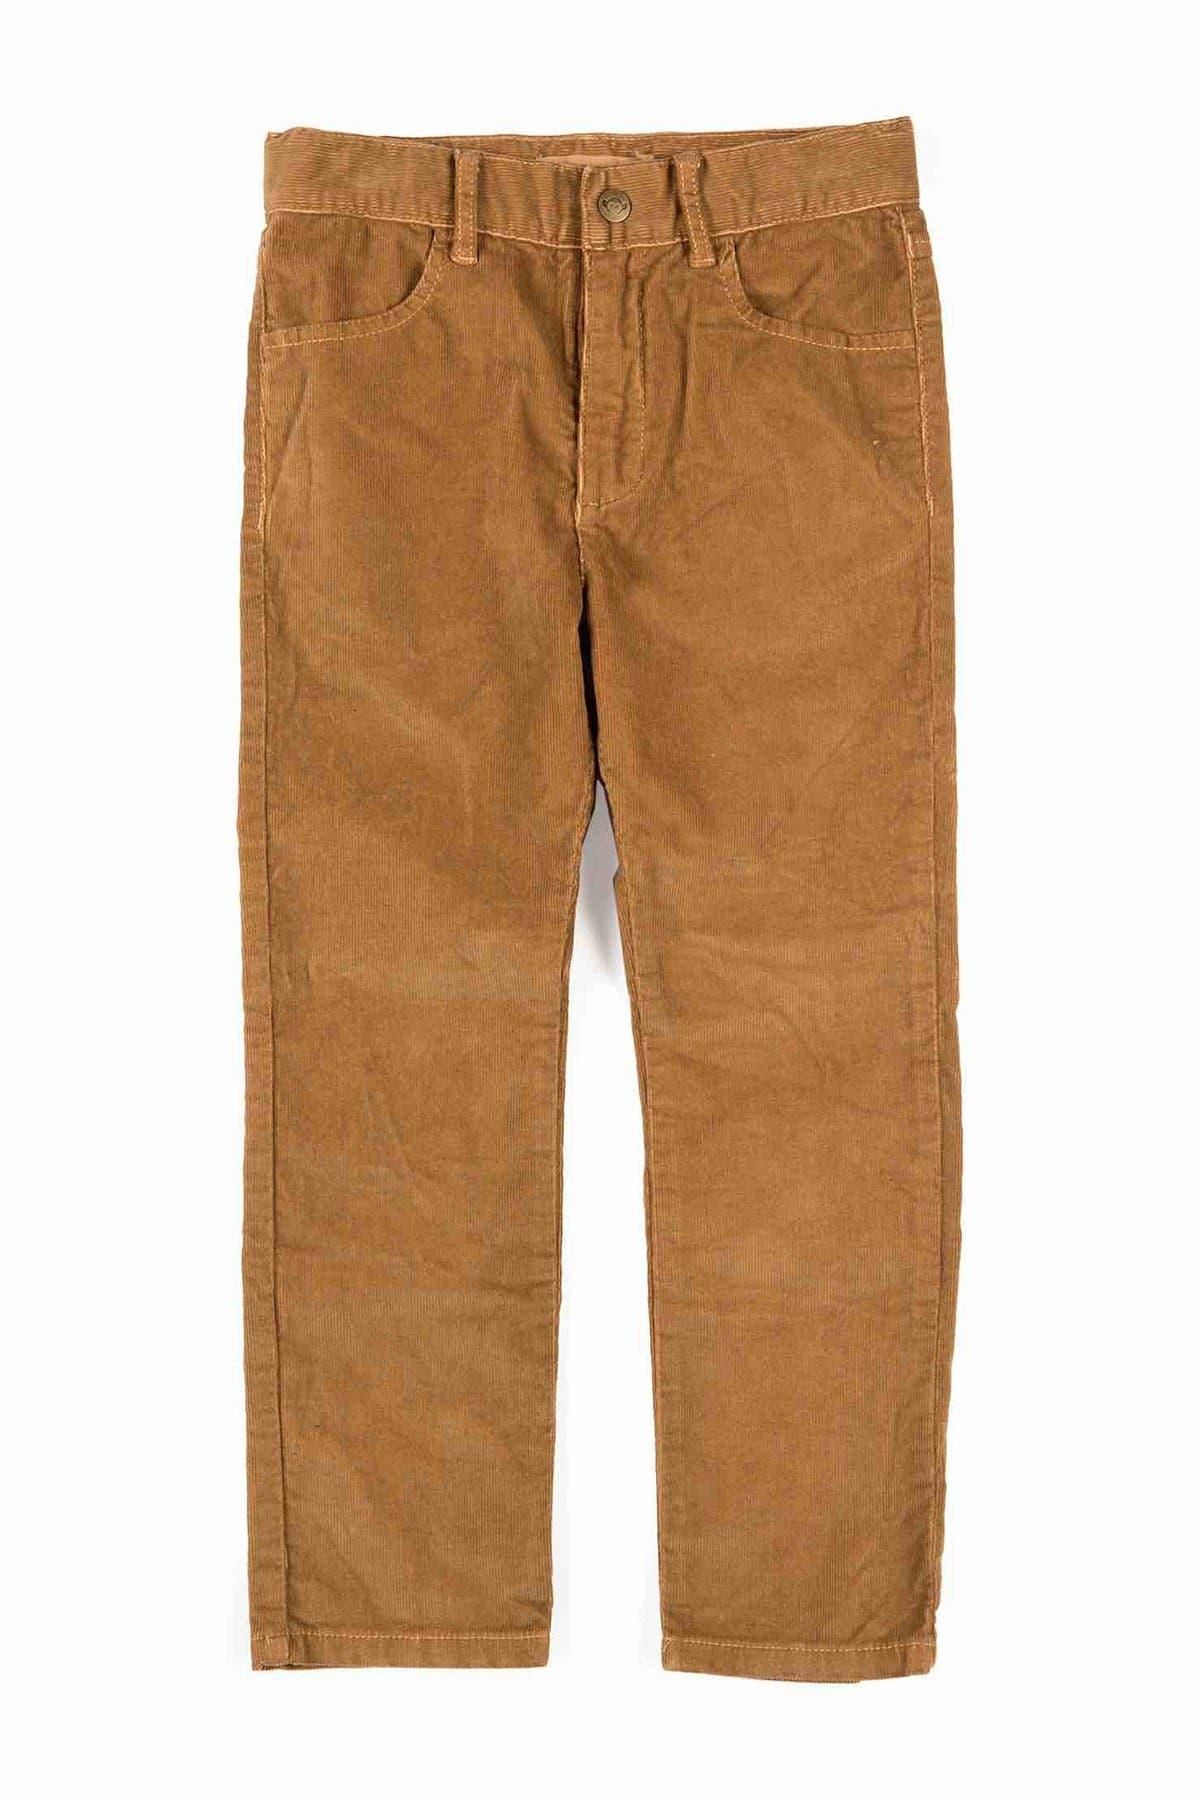 Image of Appaman Skinny Corduroy Pants